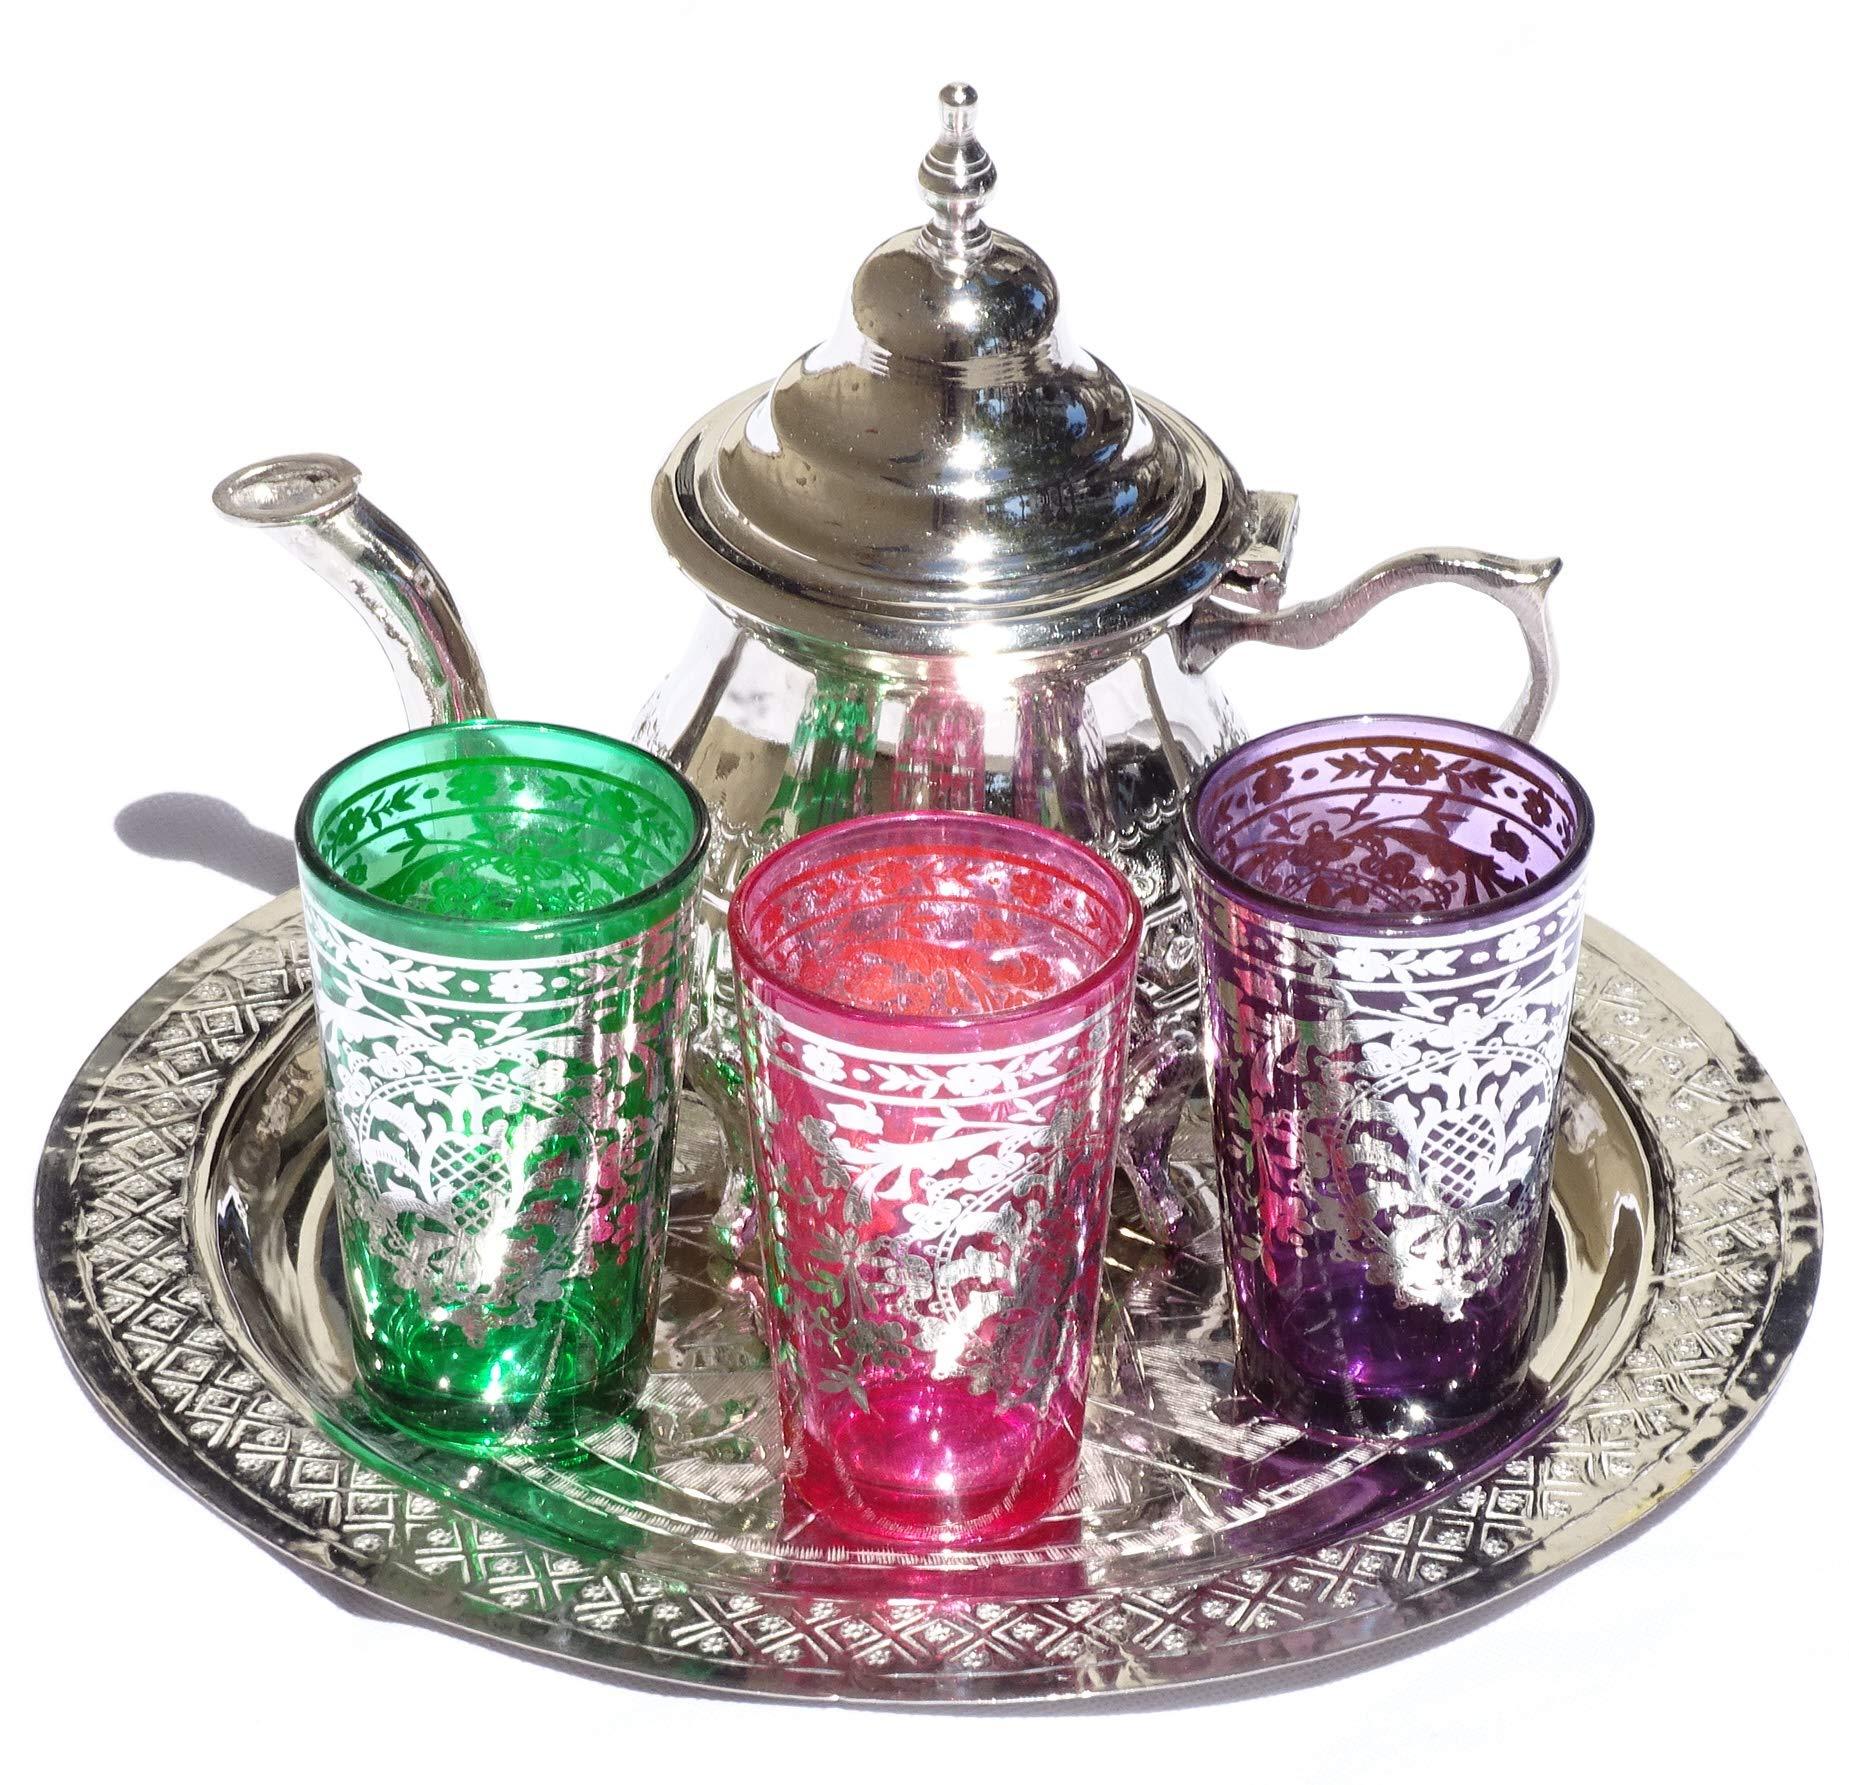 Engraved Tea Tray Moroccan Tea Set Set Of 6 Cups*NEW* Handmade Silver Teapot